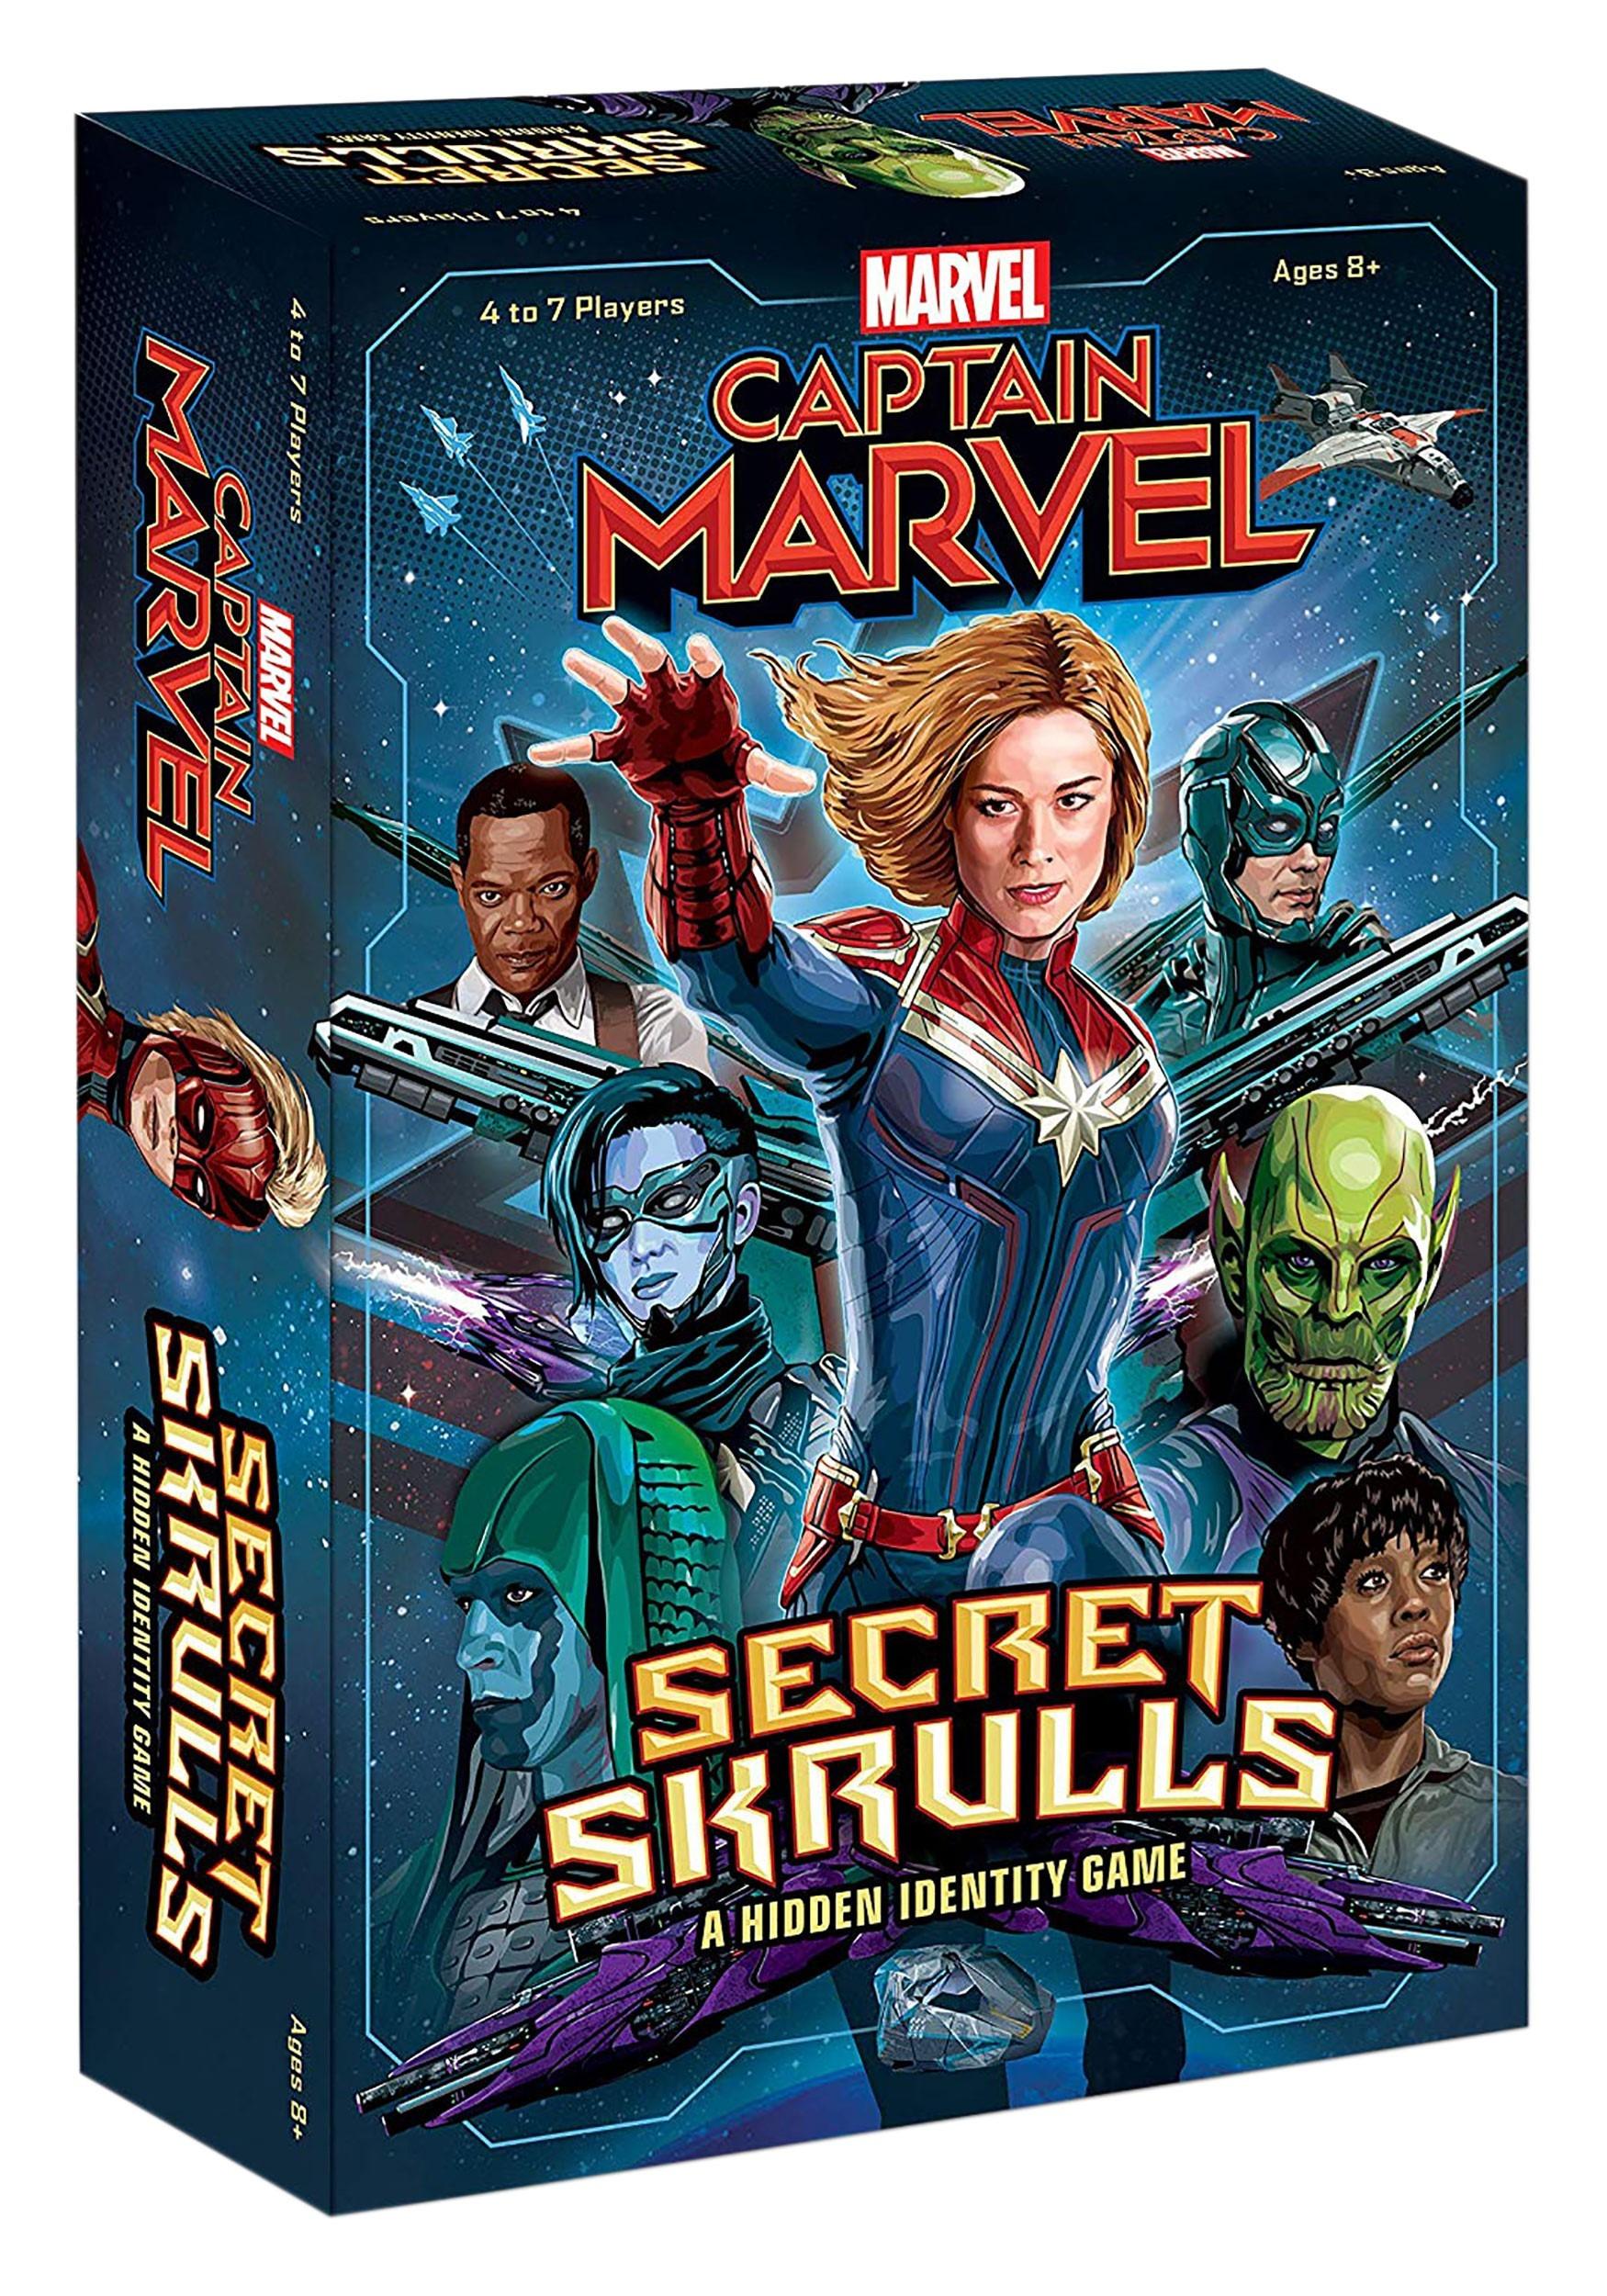 Captain Marvel: Secret Skrulls- A Hidden Identity